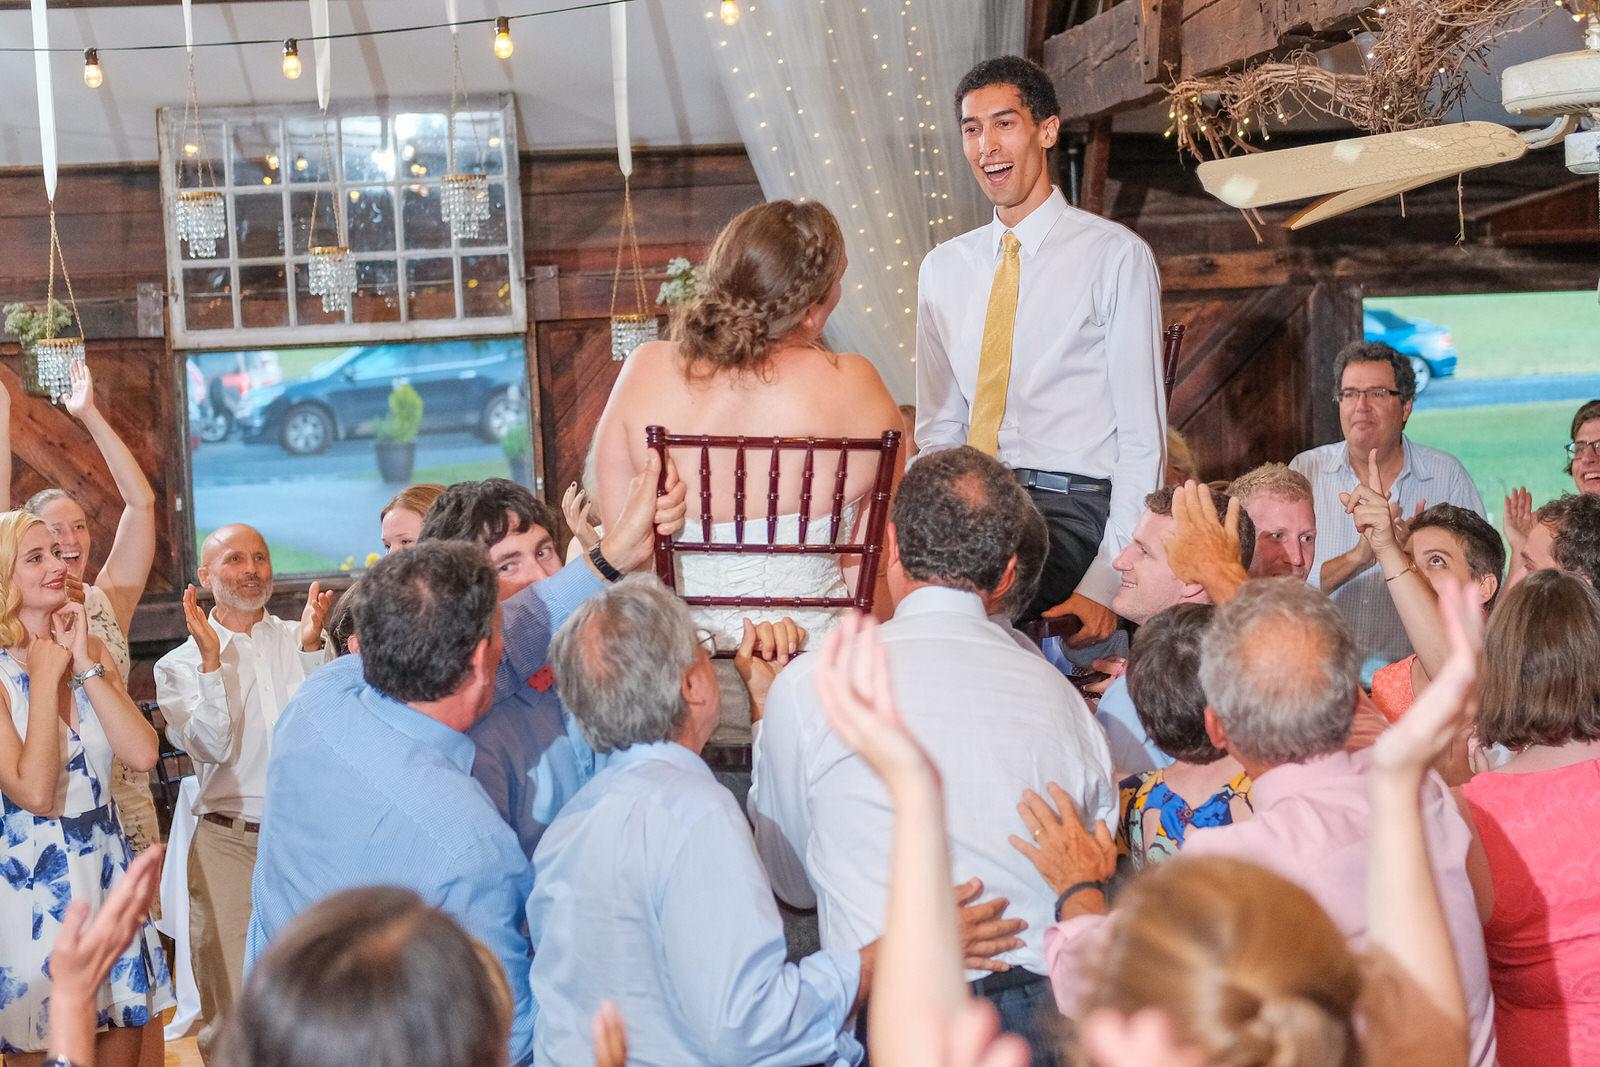 candid-vermont-wedding-photography-1372.jpg